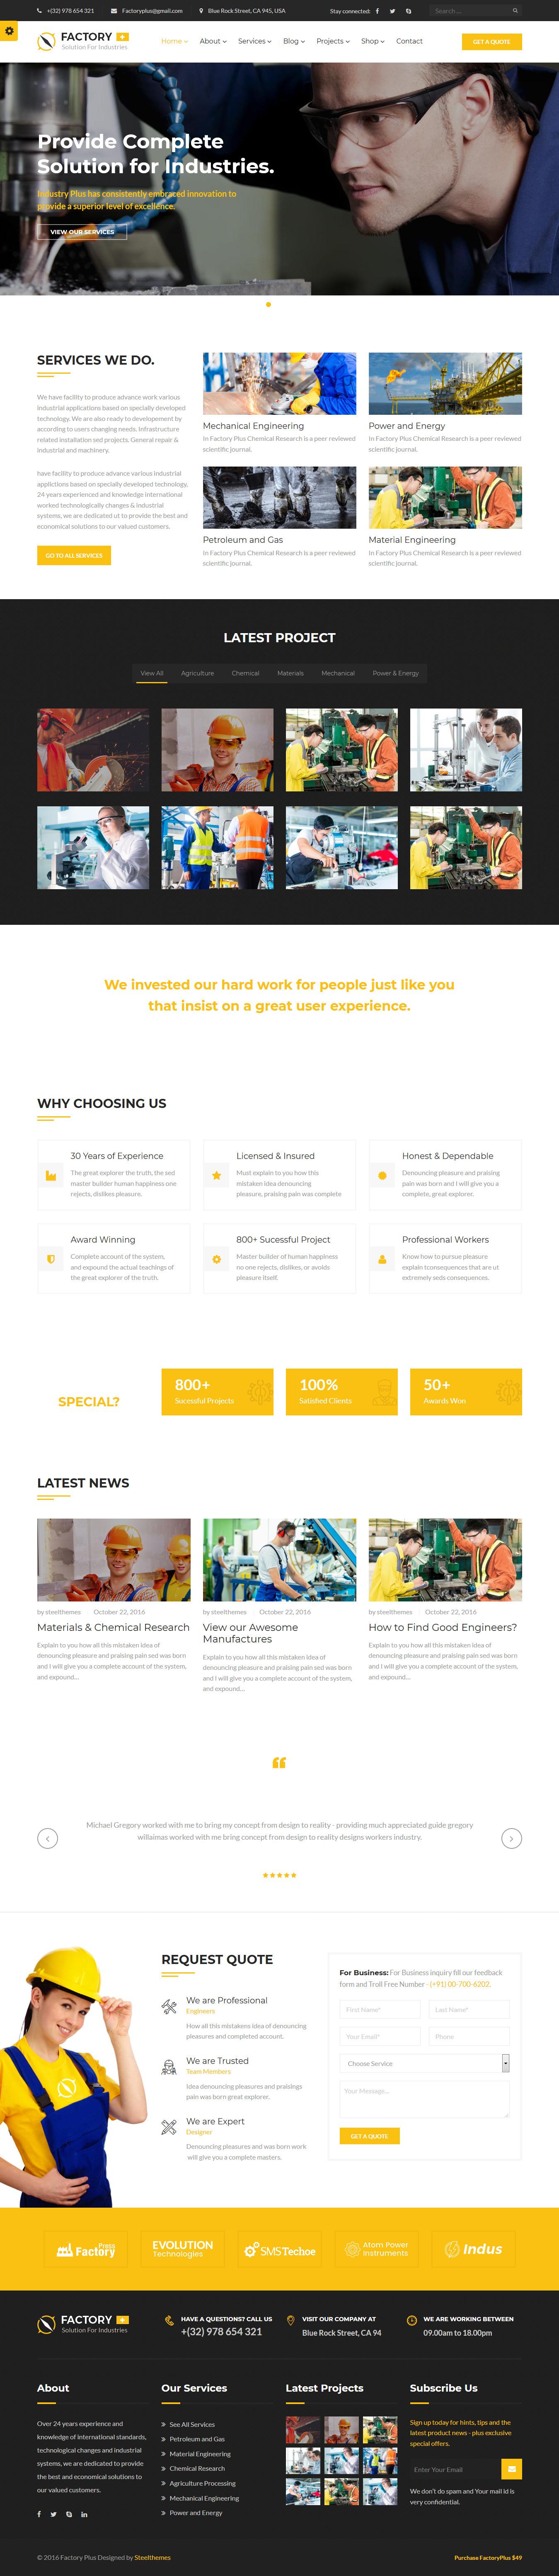 Factory Plus - Best Premium Construction Business Company WordPress Theme